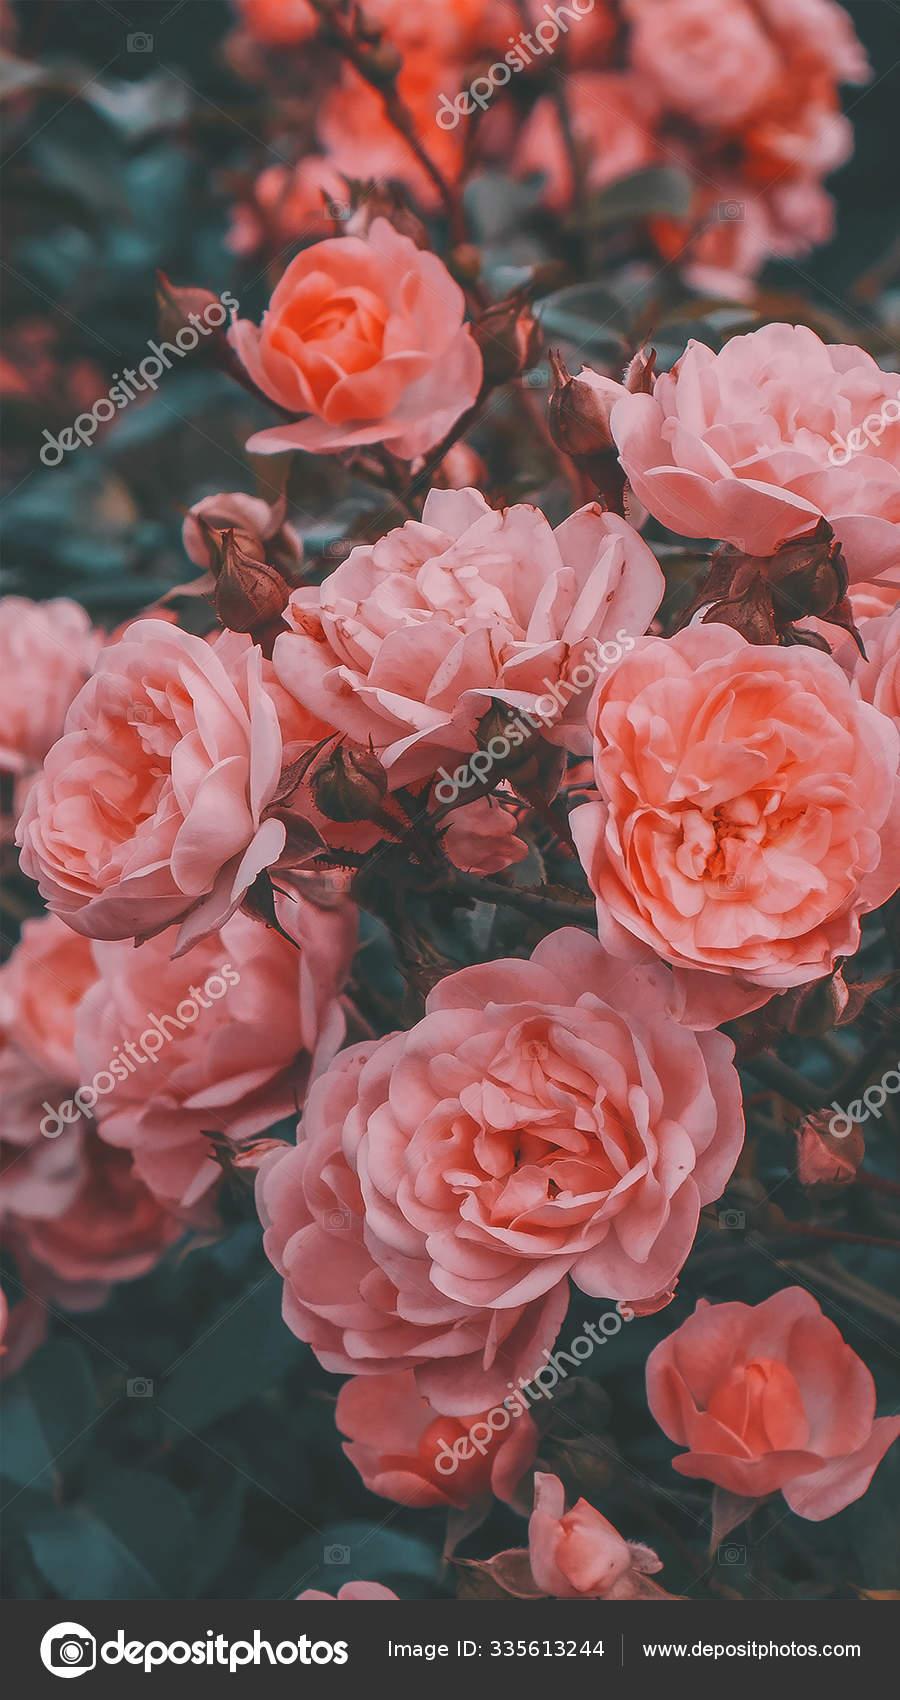 Fashion Aesthetic Wallpaper Phone White Flowers On Black Background Stock Photo Image By C Porechenskaya 335613244